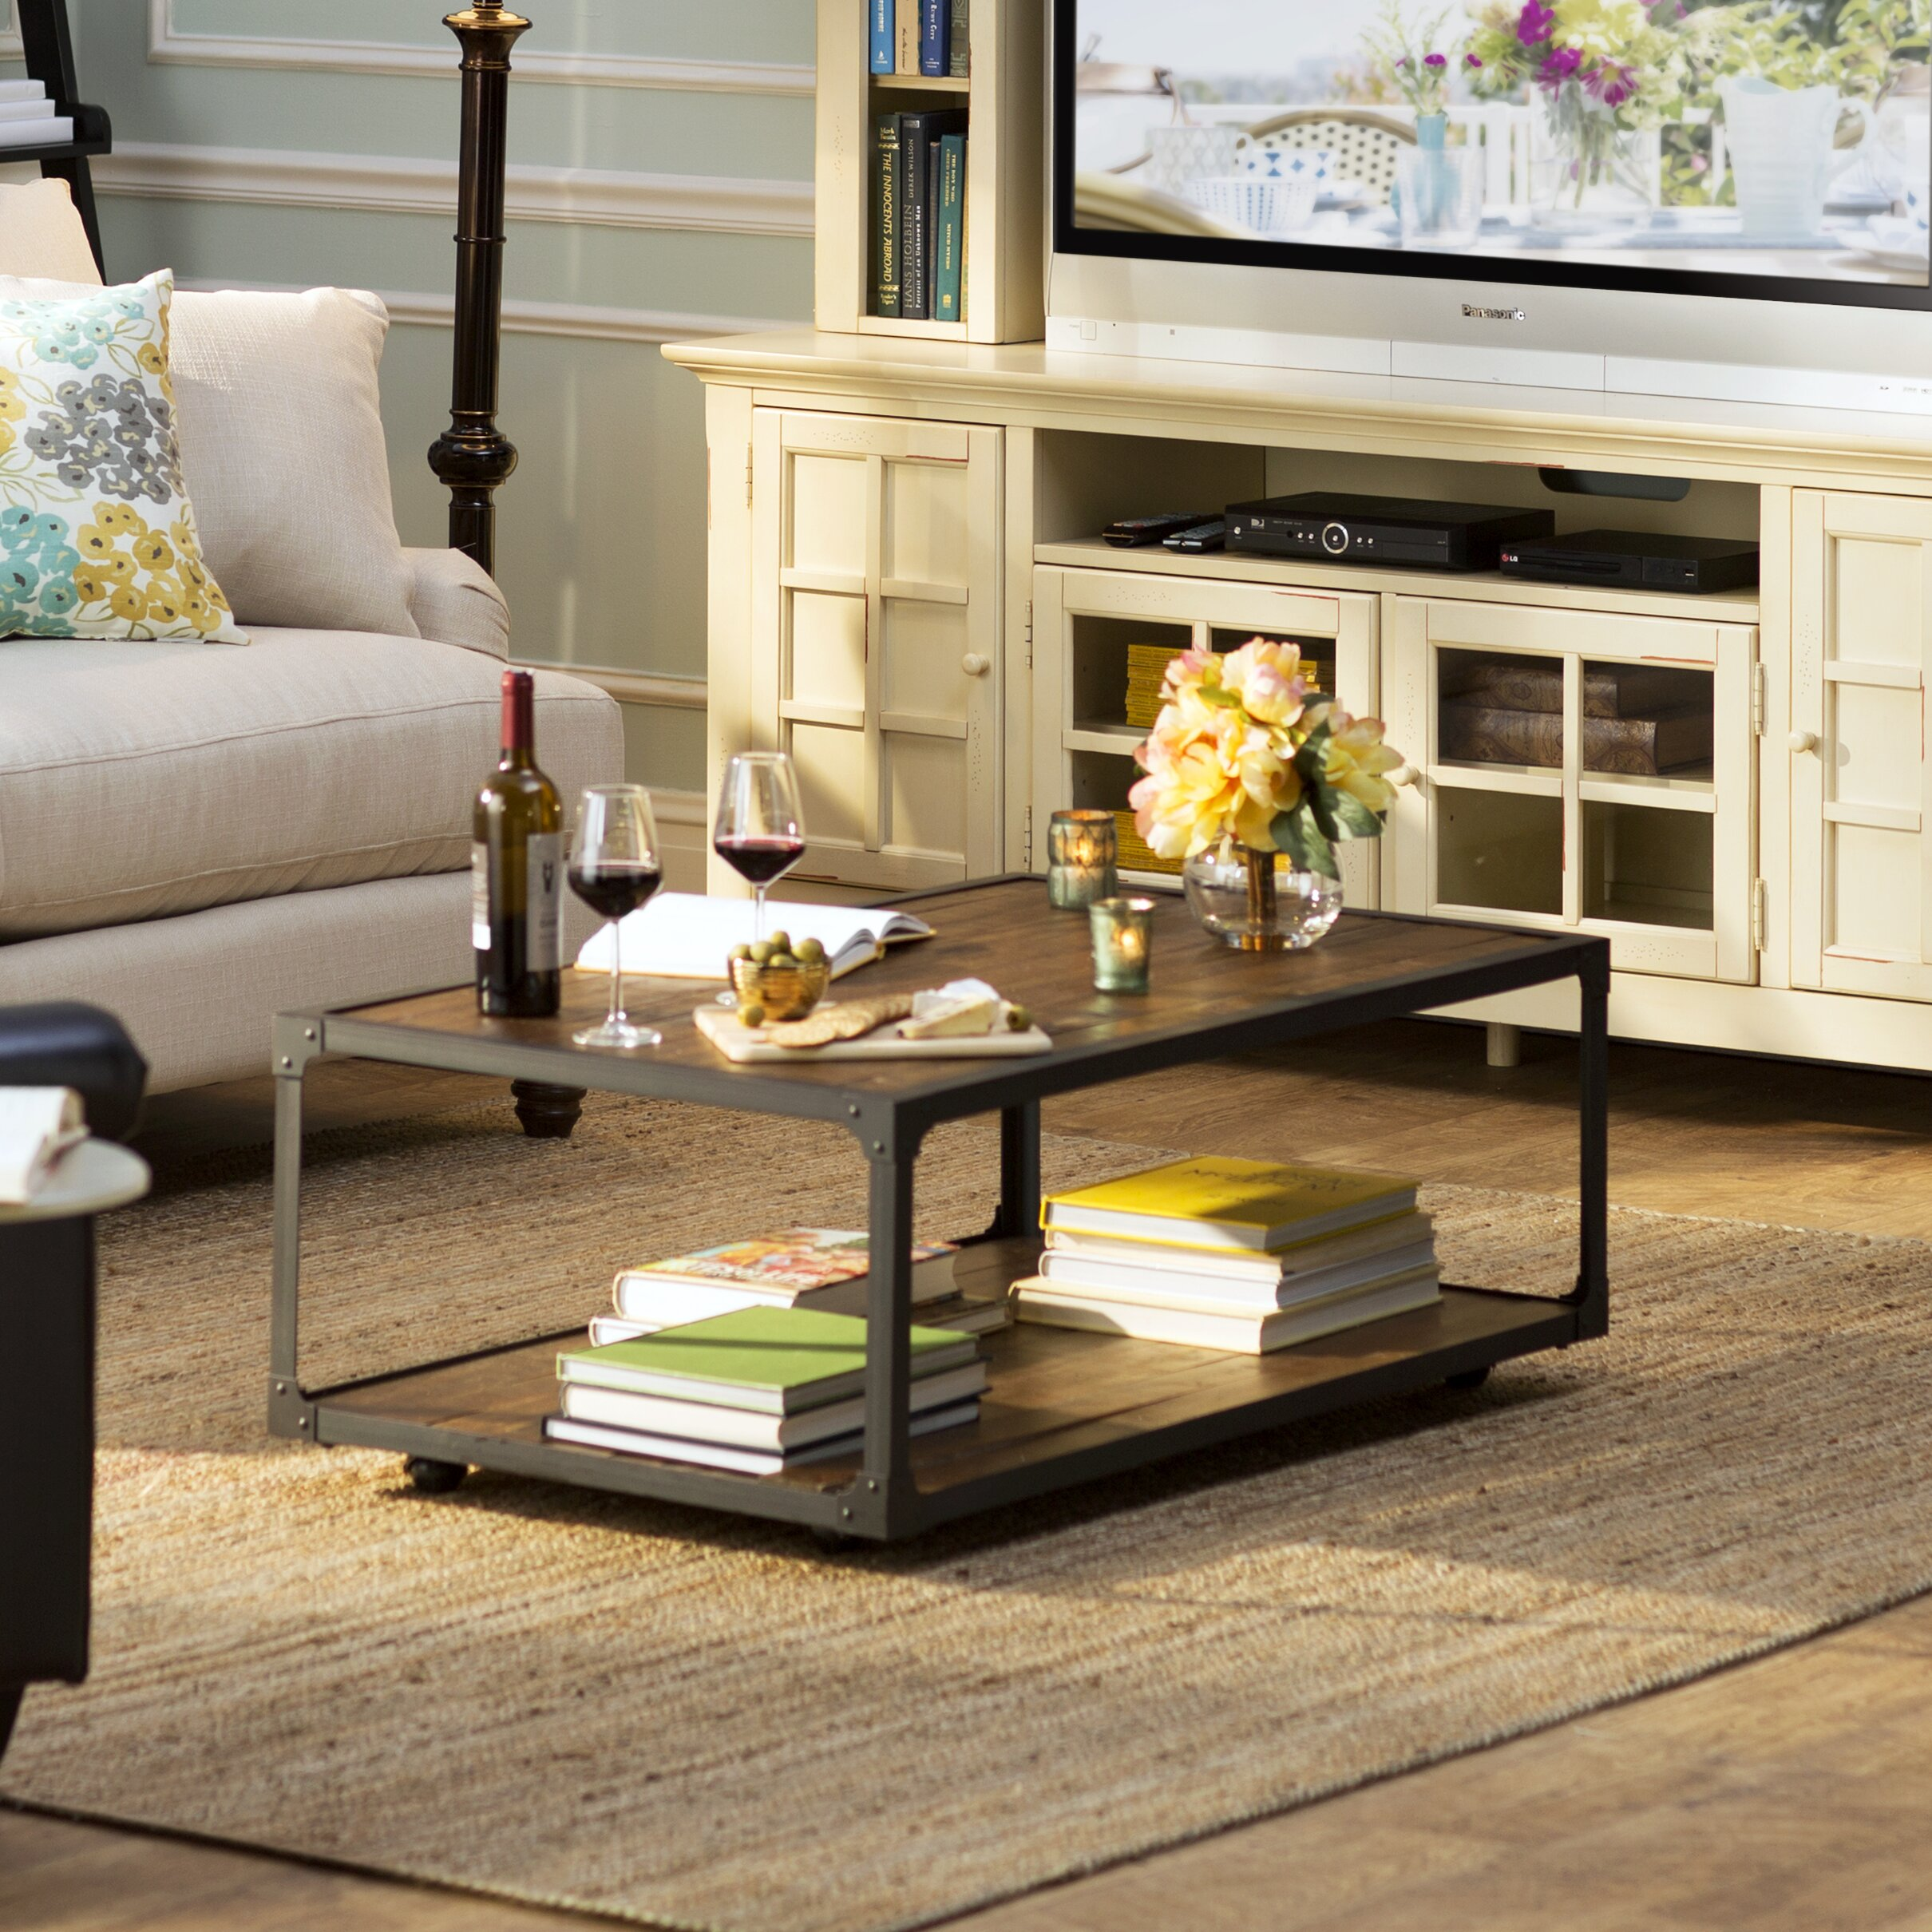 Trent Austin Design Laguna Coffee Table Reviews: Trent Austin Design Beltzhoover Coffee Table & Reviews